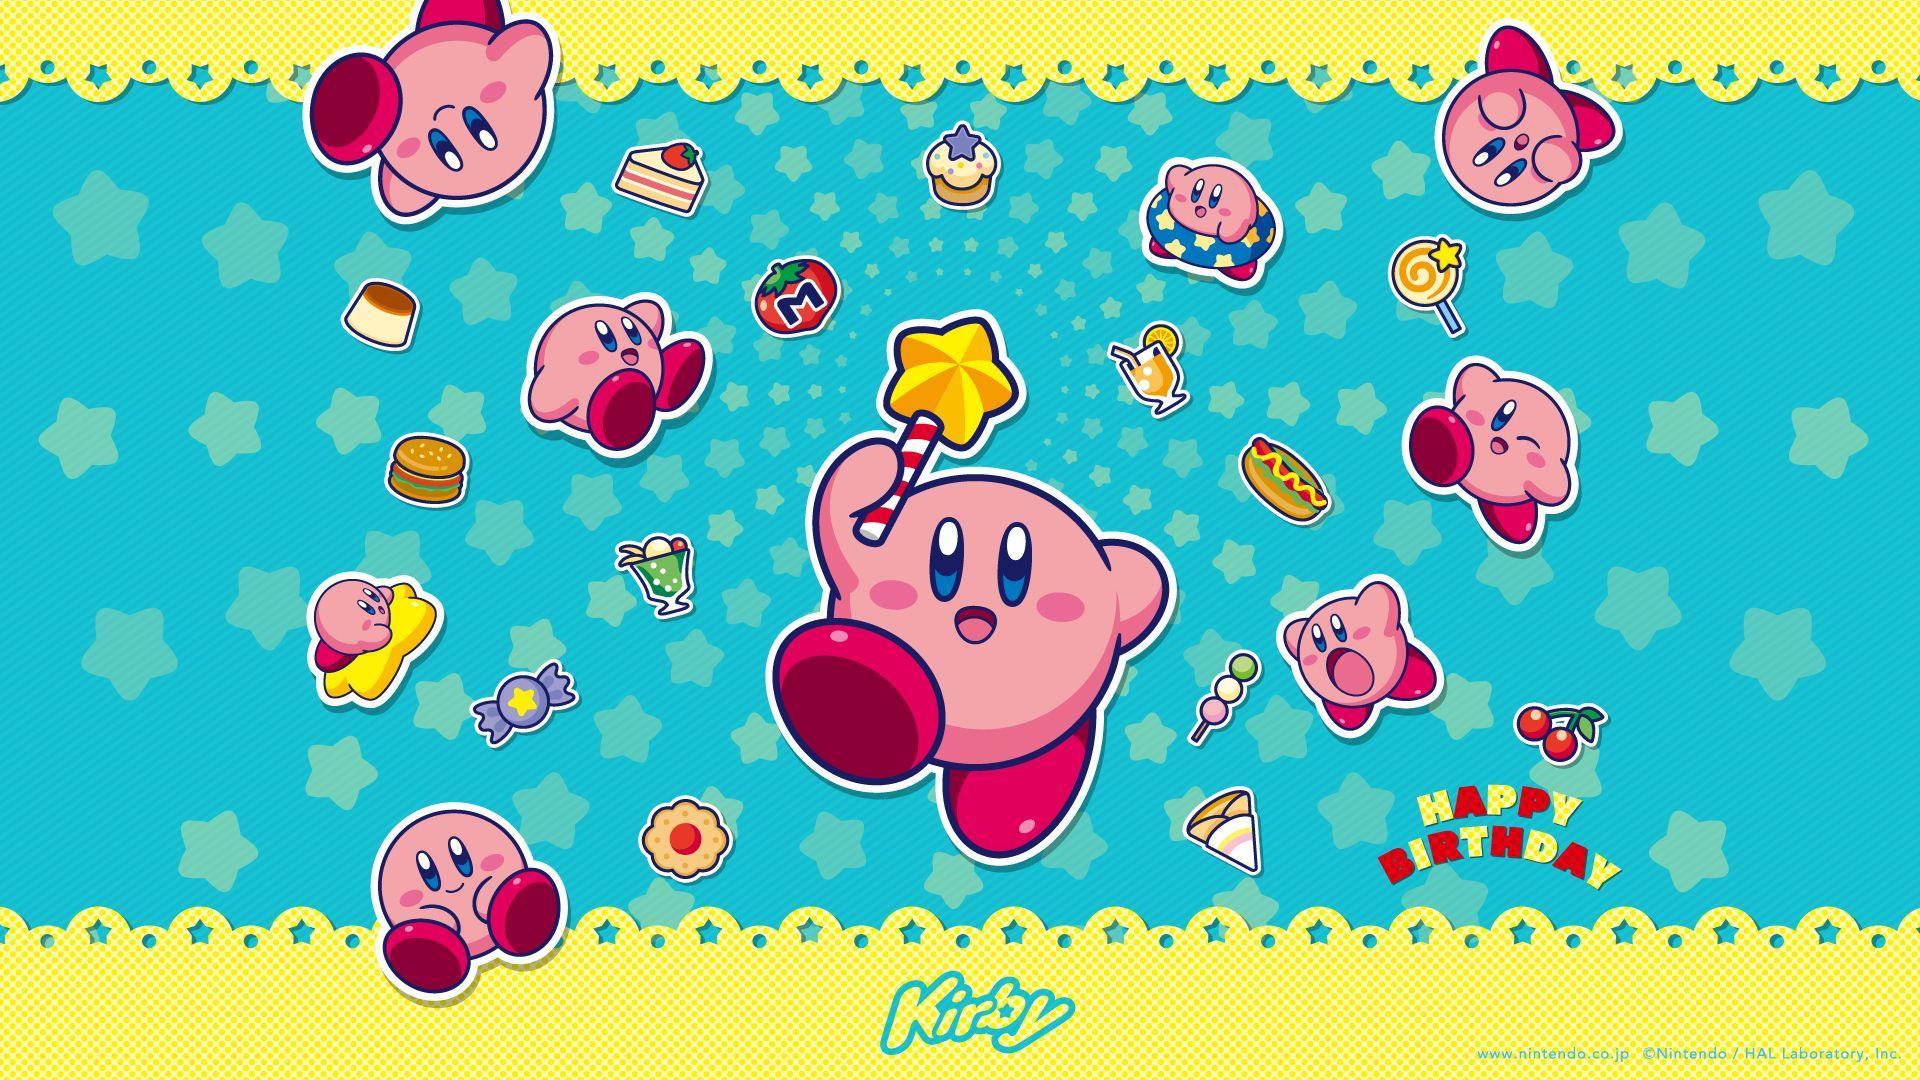 Elex Game Wallpaper Kirby Kirby Nintendo Happy Wallpaper